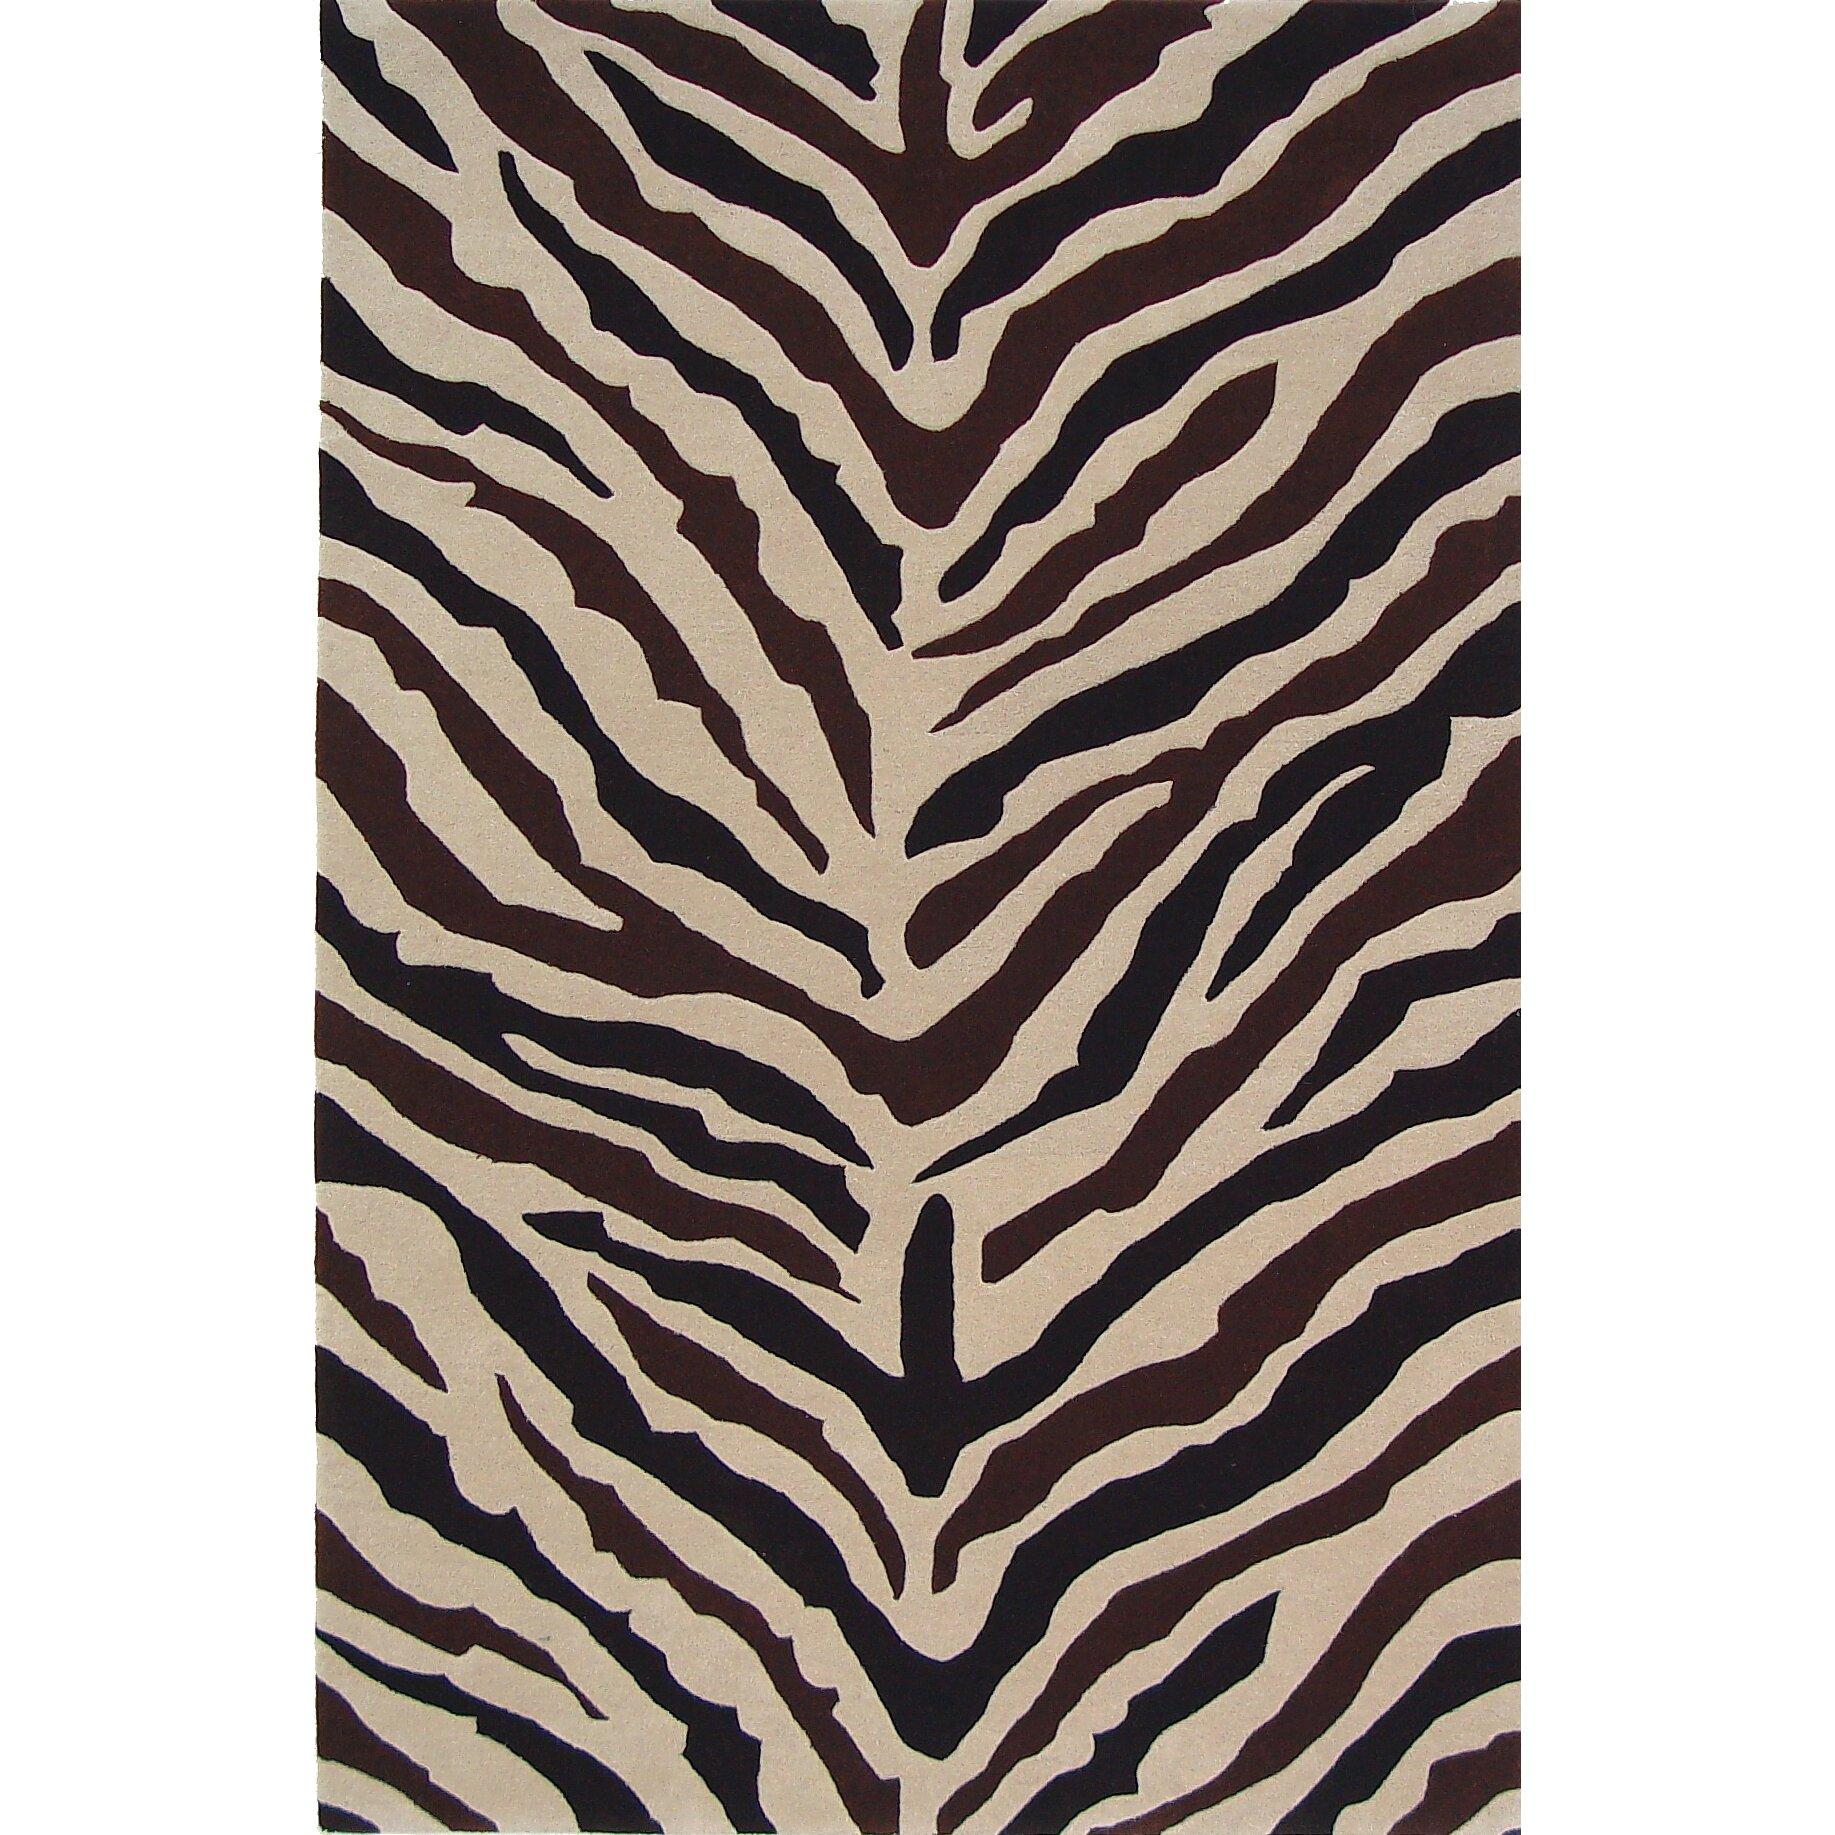 Zebra Rug Wayfair: Meva Rugs Sway Zebra Rug